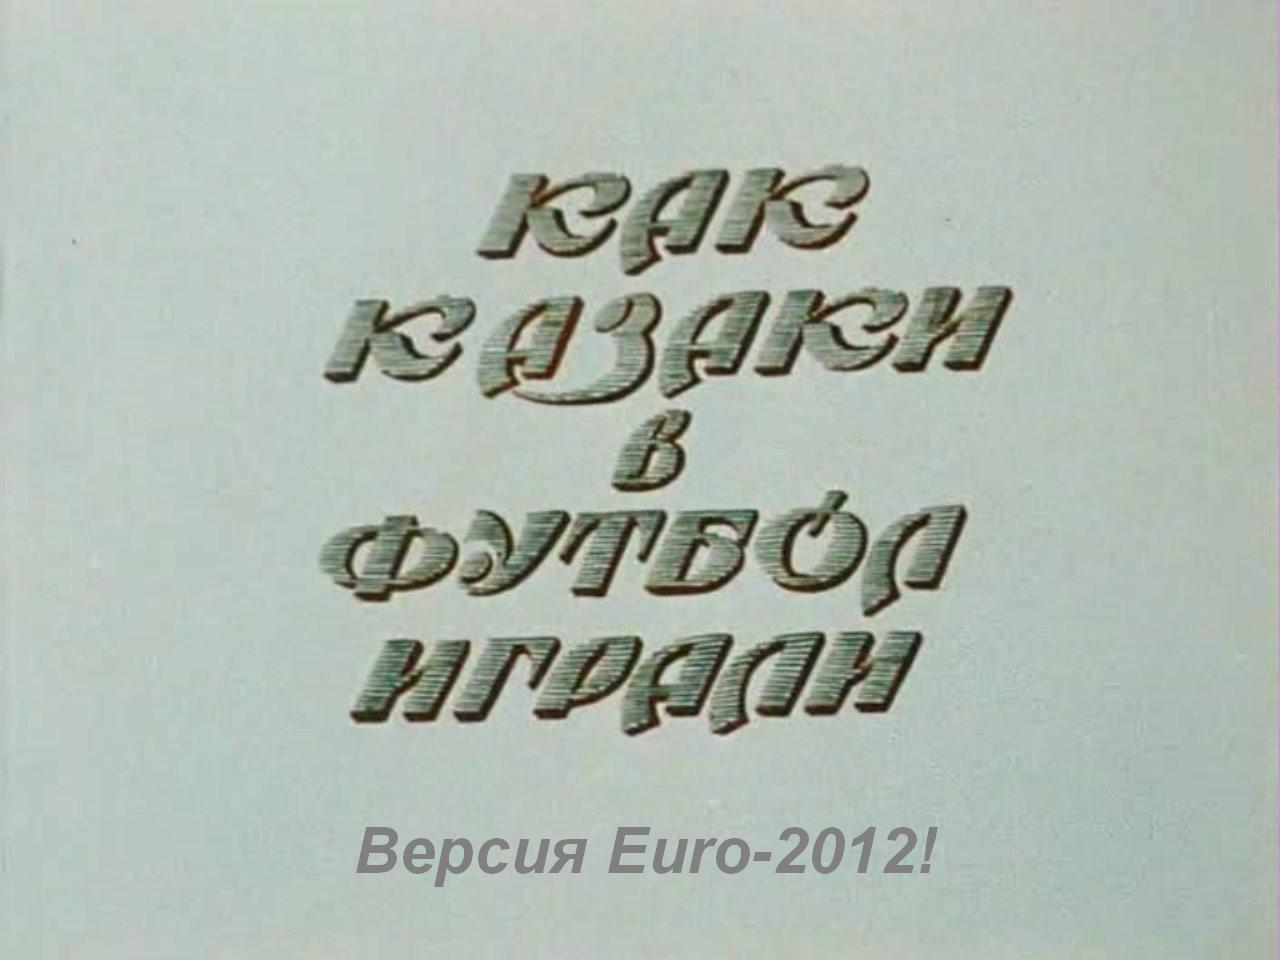 Как козаки в футбол играли... Версия Euro-2012!